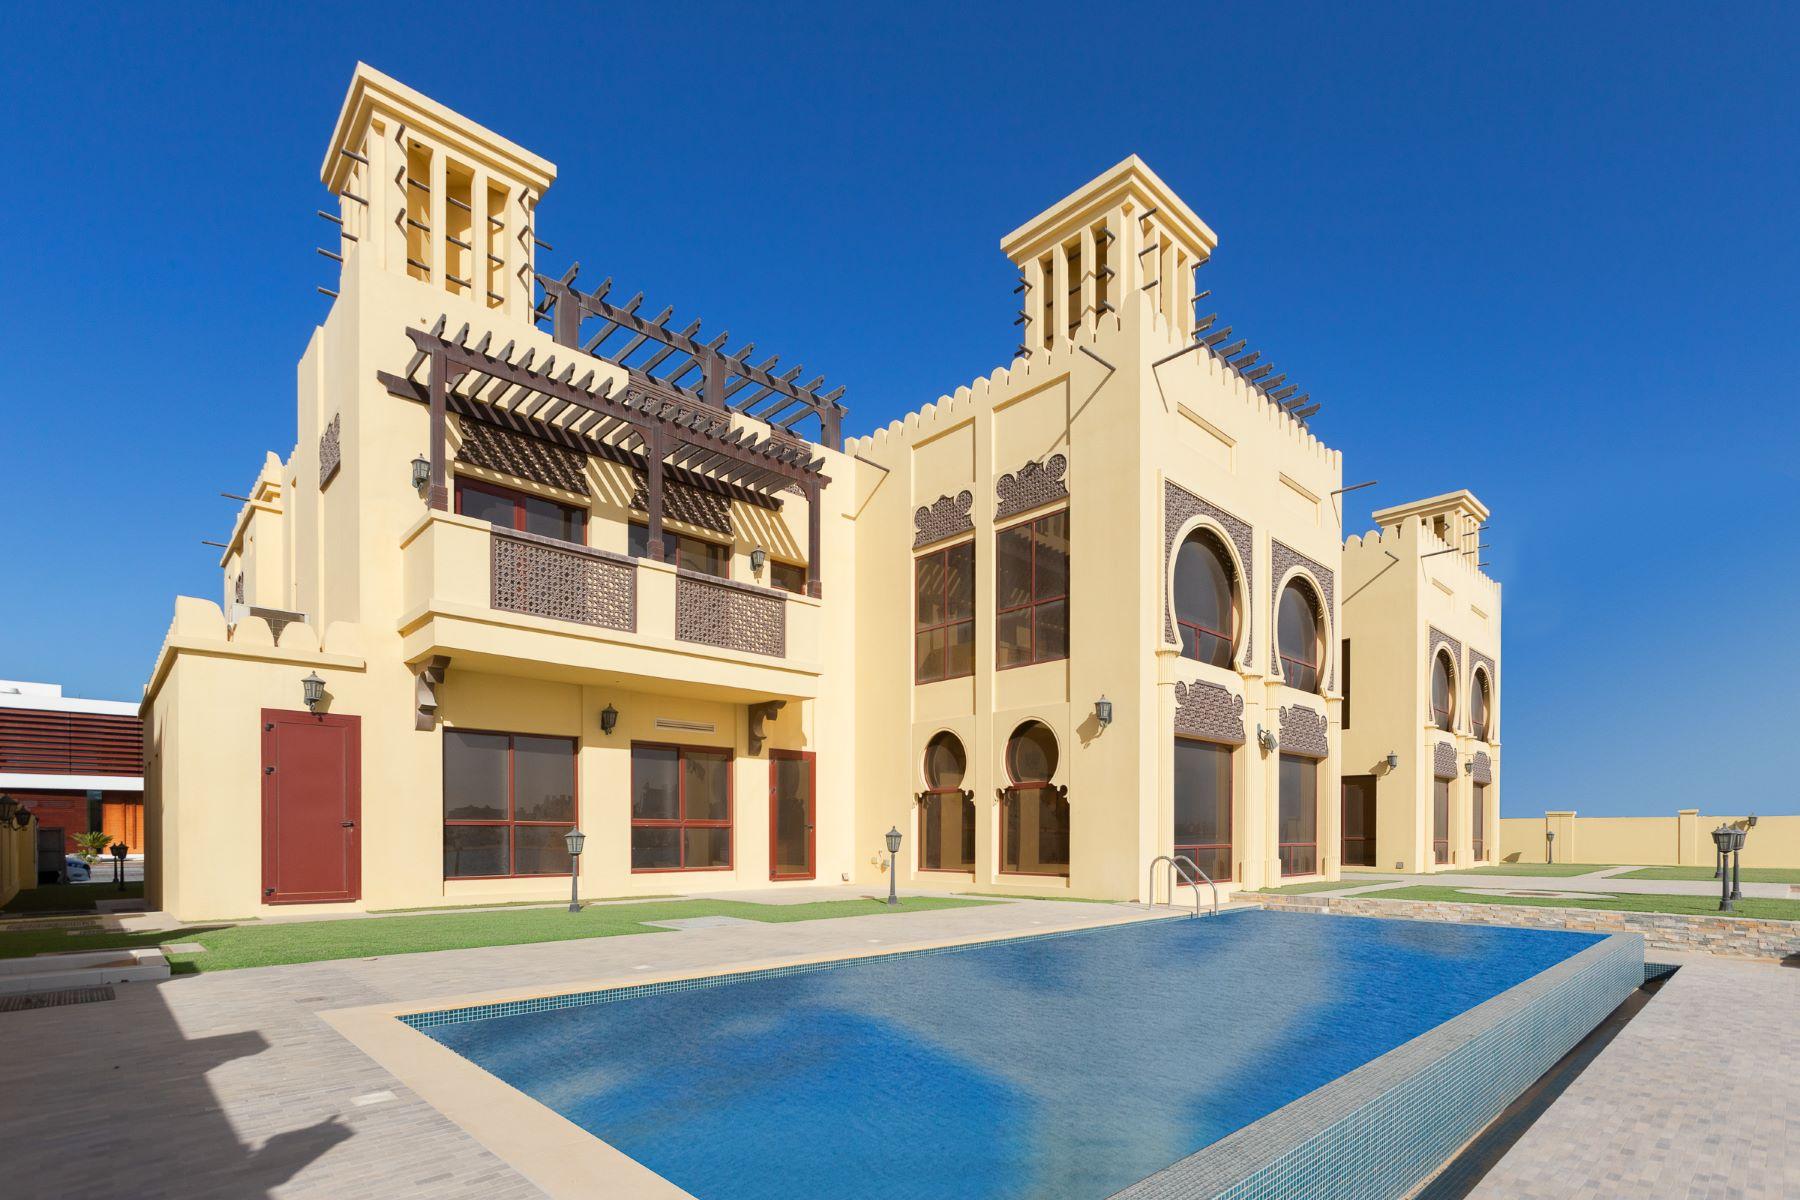 Property for Sale at Custom Built Villa Marina Skyline View Signature Villas Palm Jumeirah Dubai, Dubai 12345 United Arab Emirates